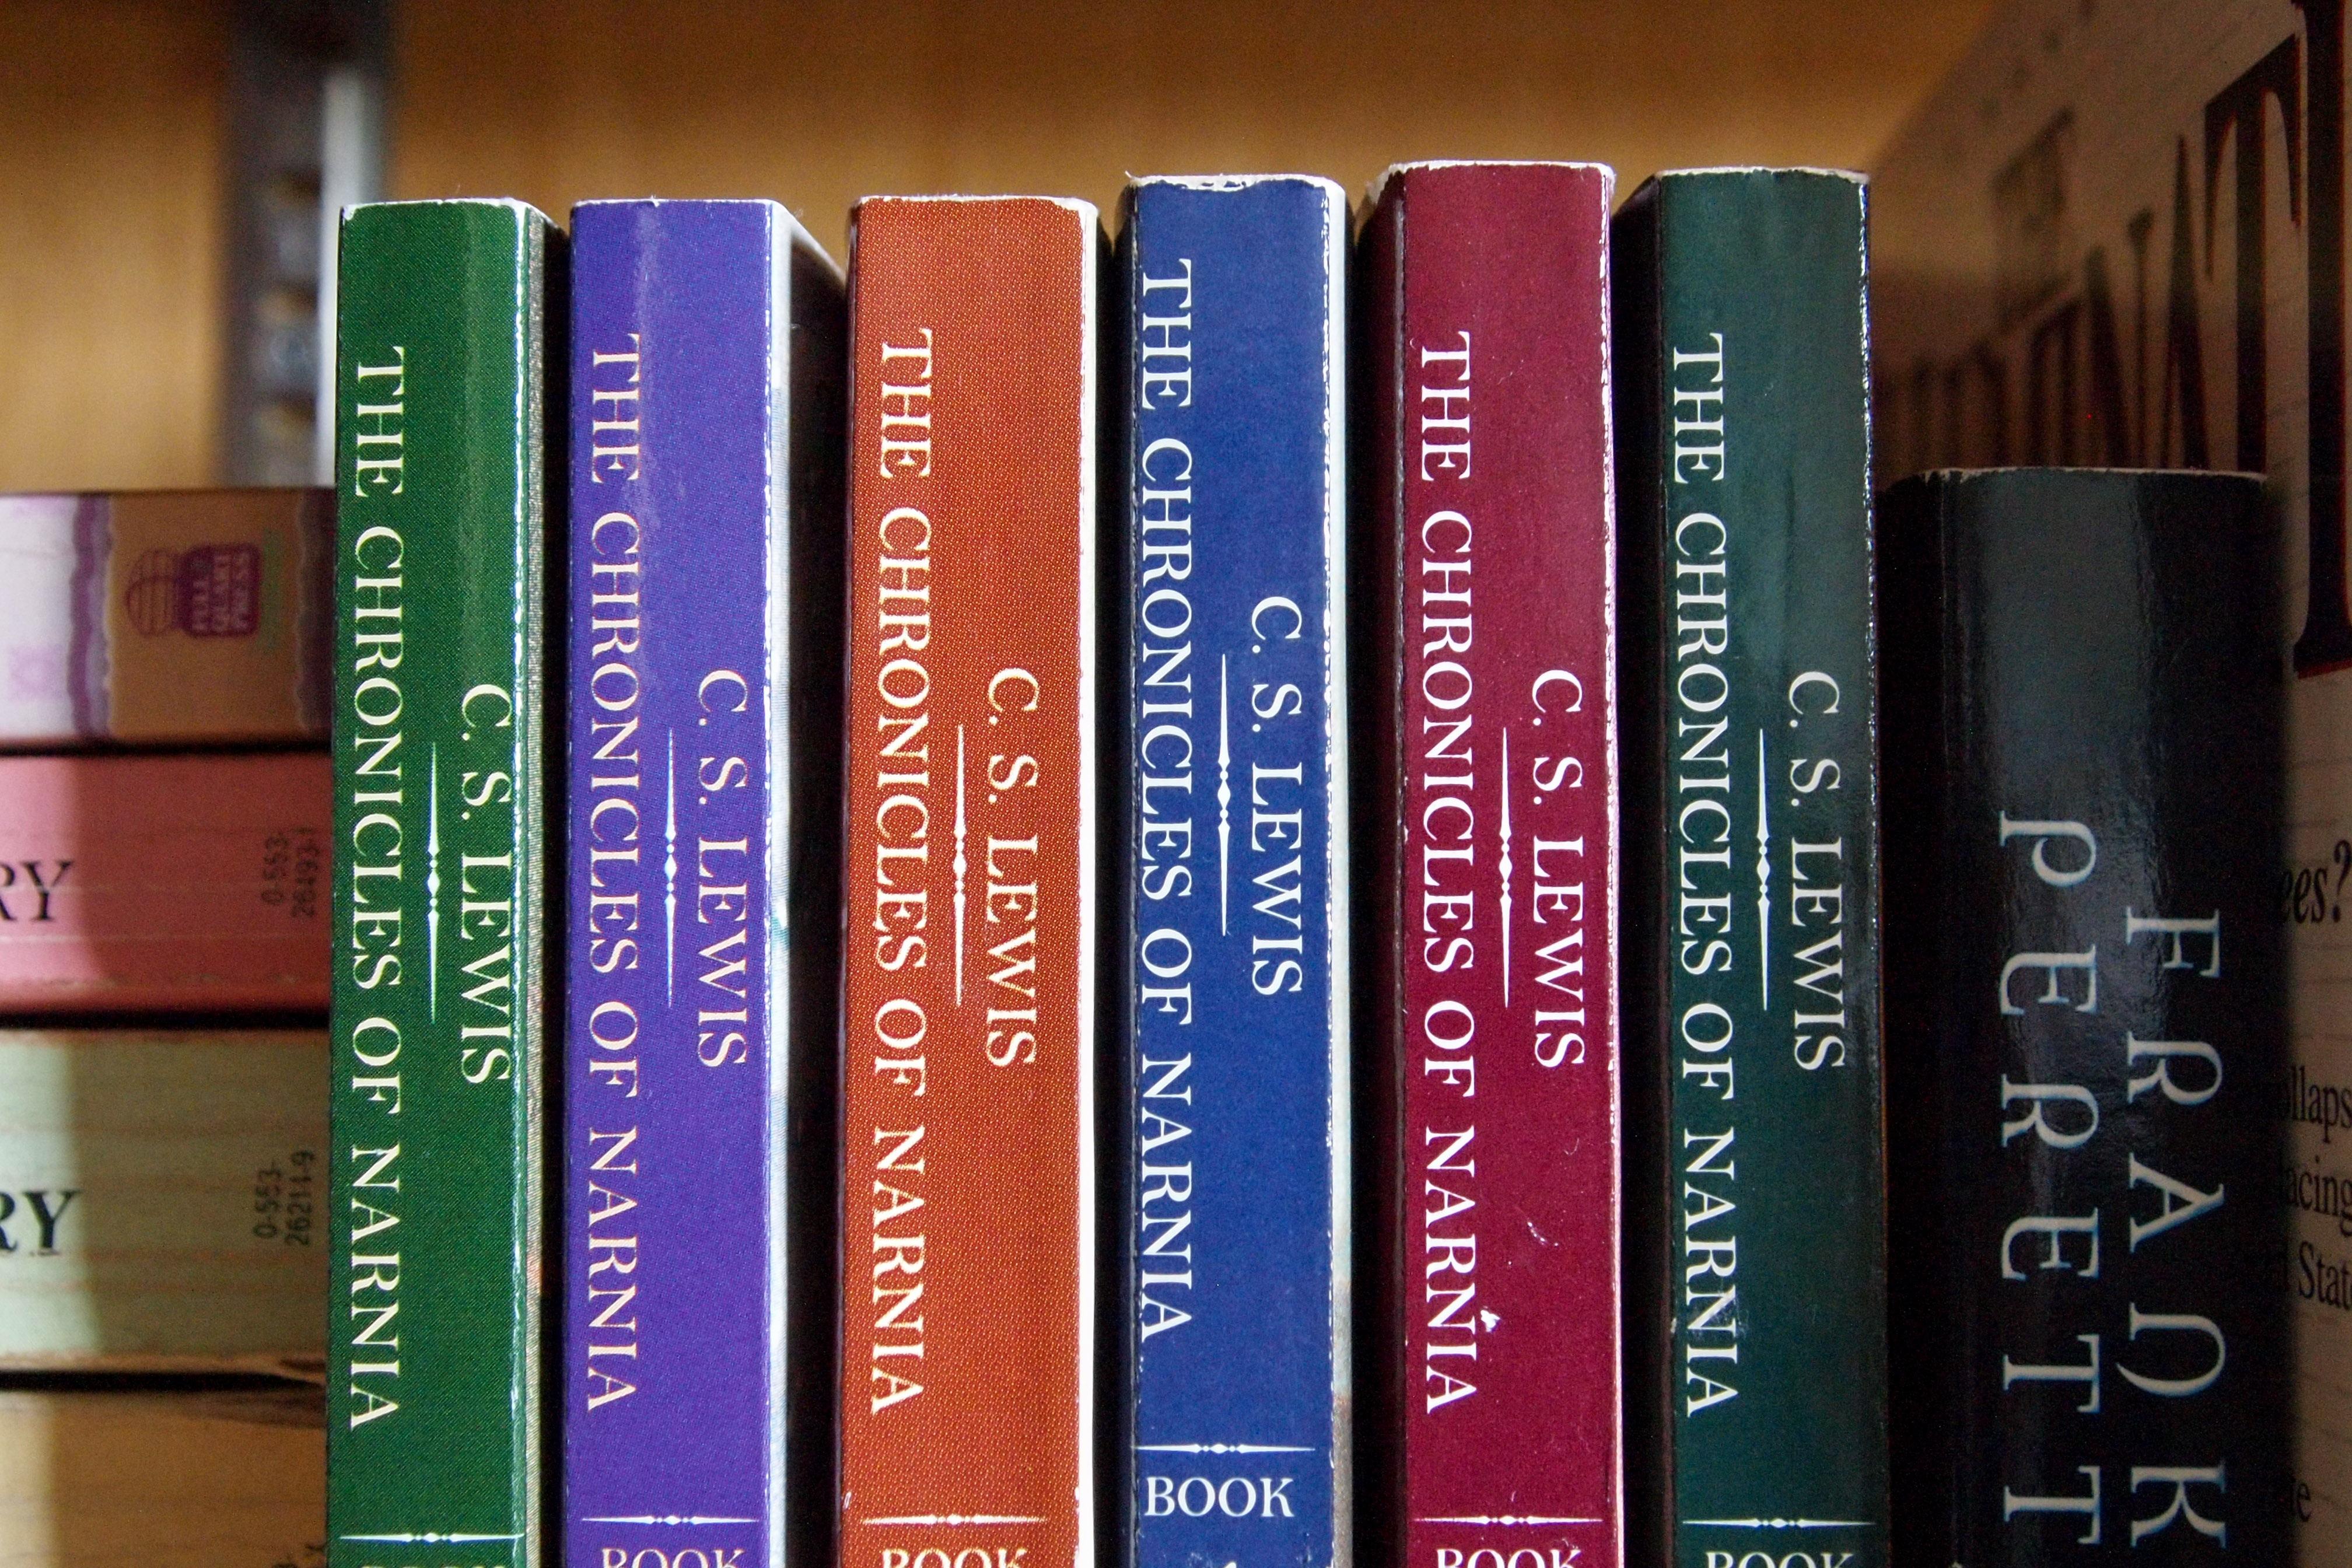 books-reading-series-narnia-159778